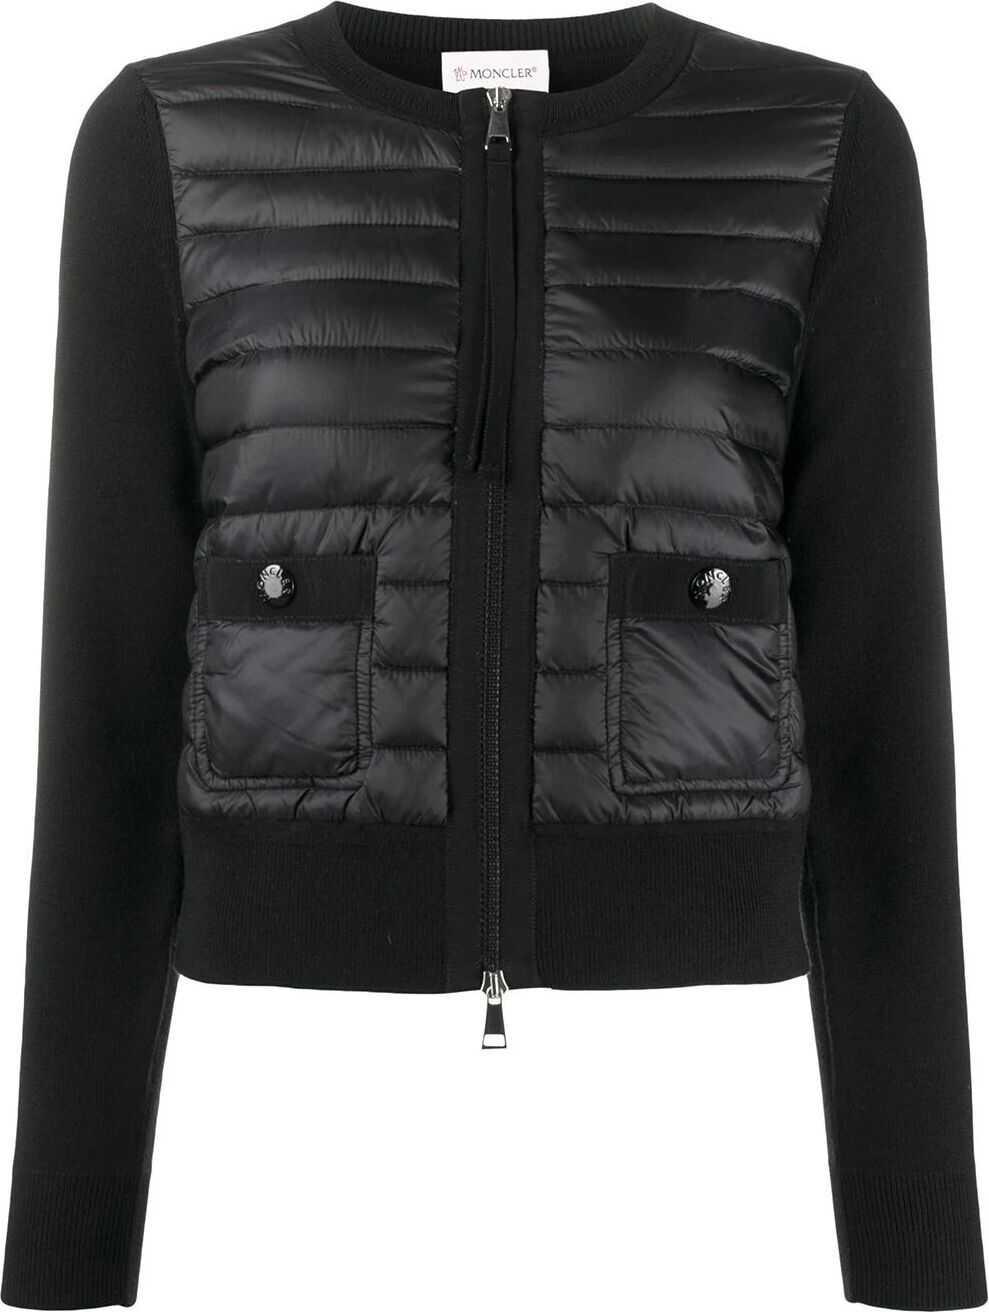 Moncler Polyamide Outerwear Jacket BLACK